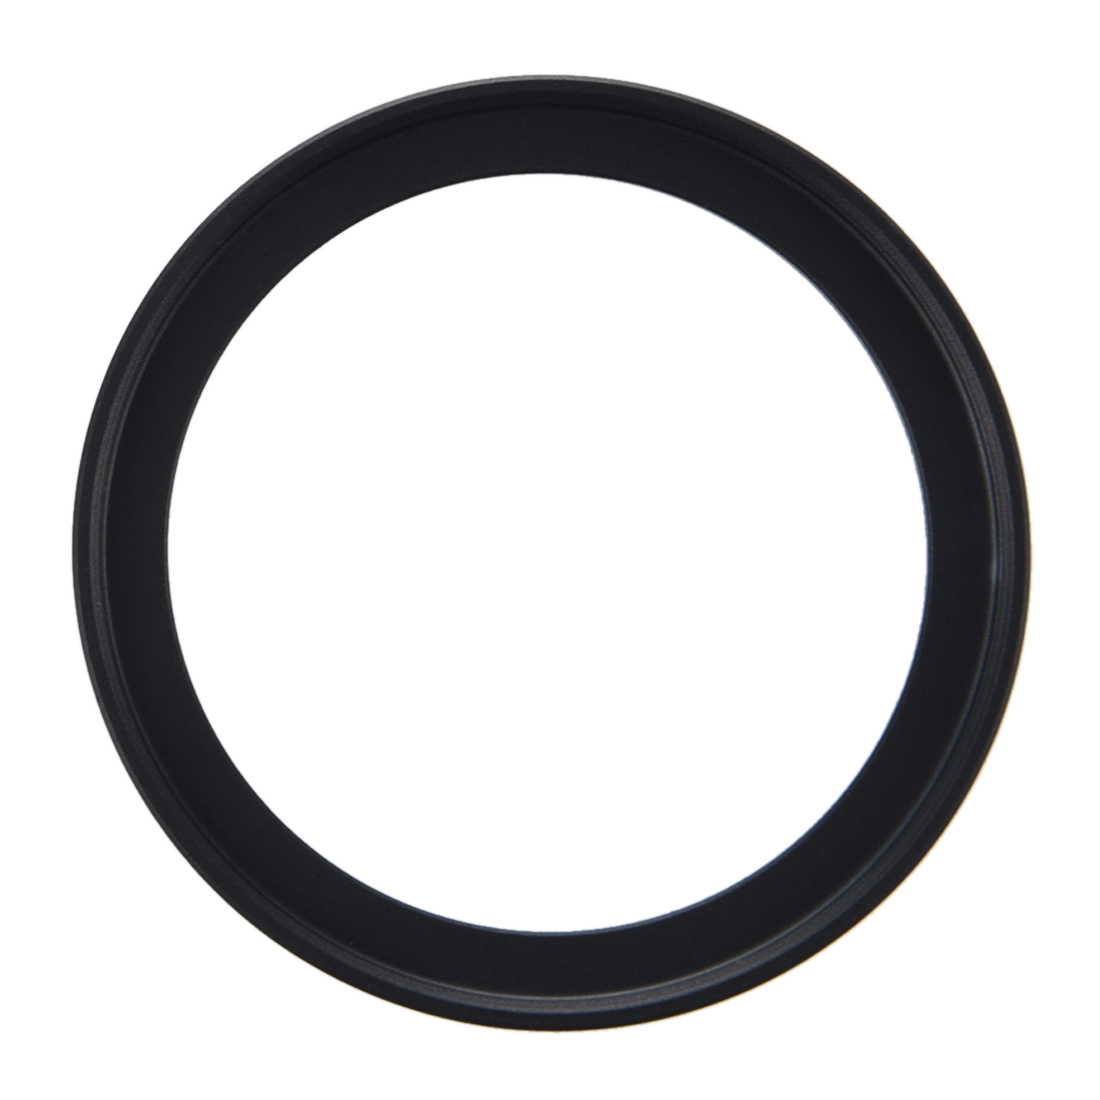 Camera Repairing 46mm to 52mm Metal Step Up Filter Ring Adapter